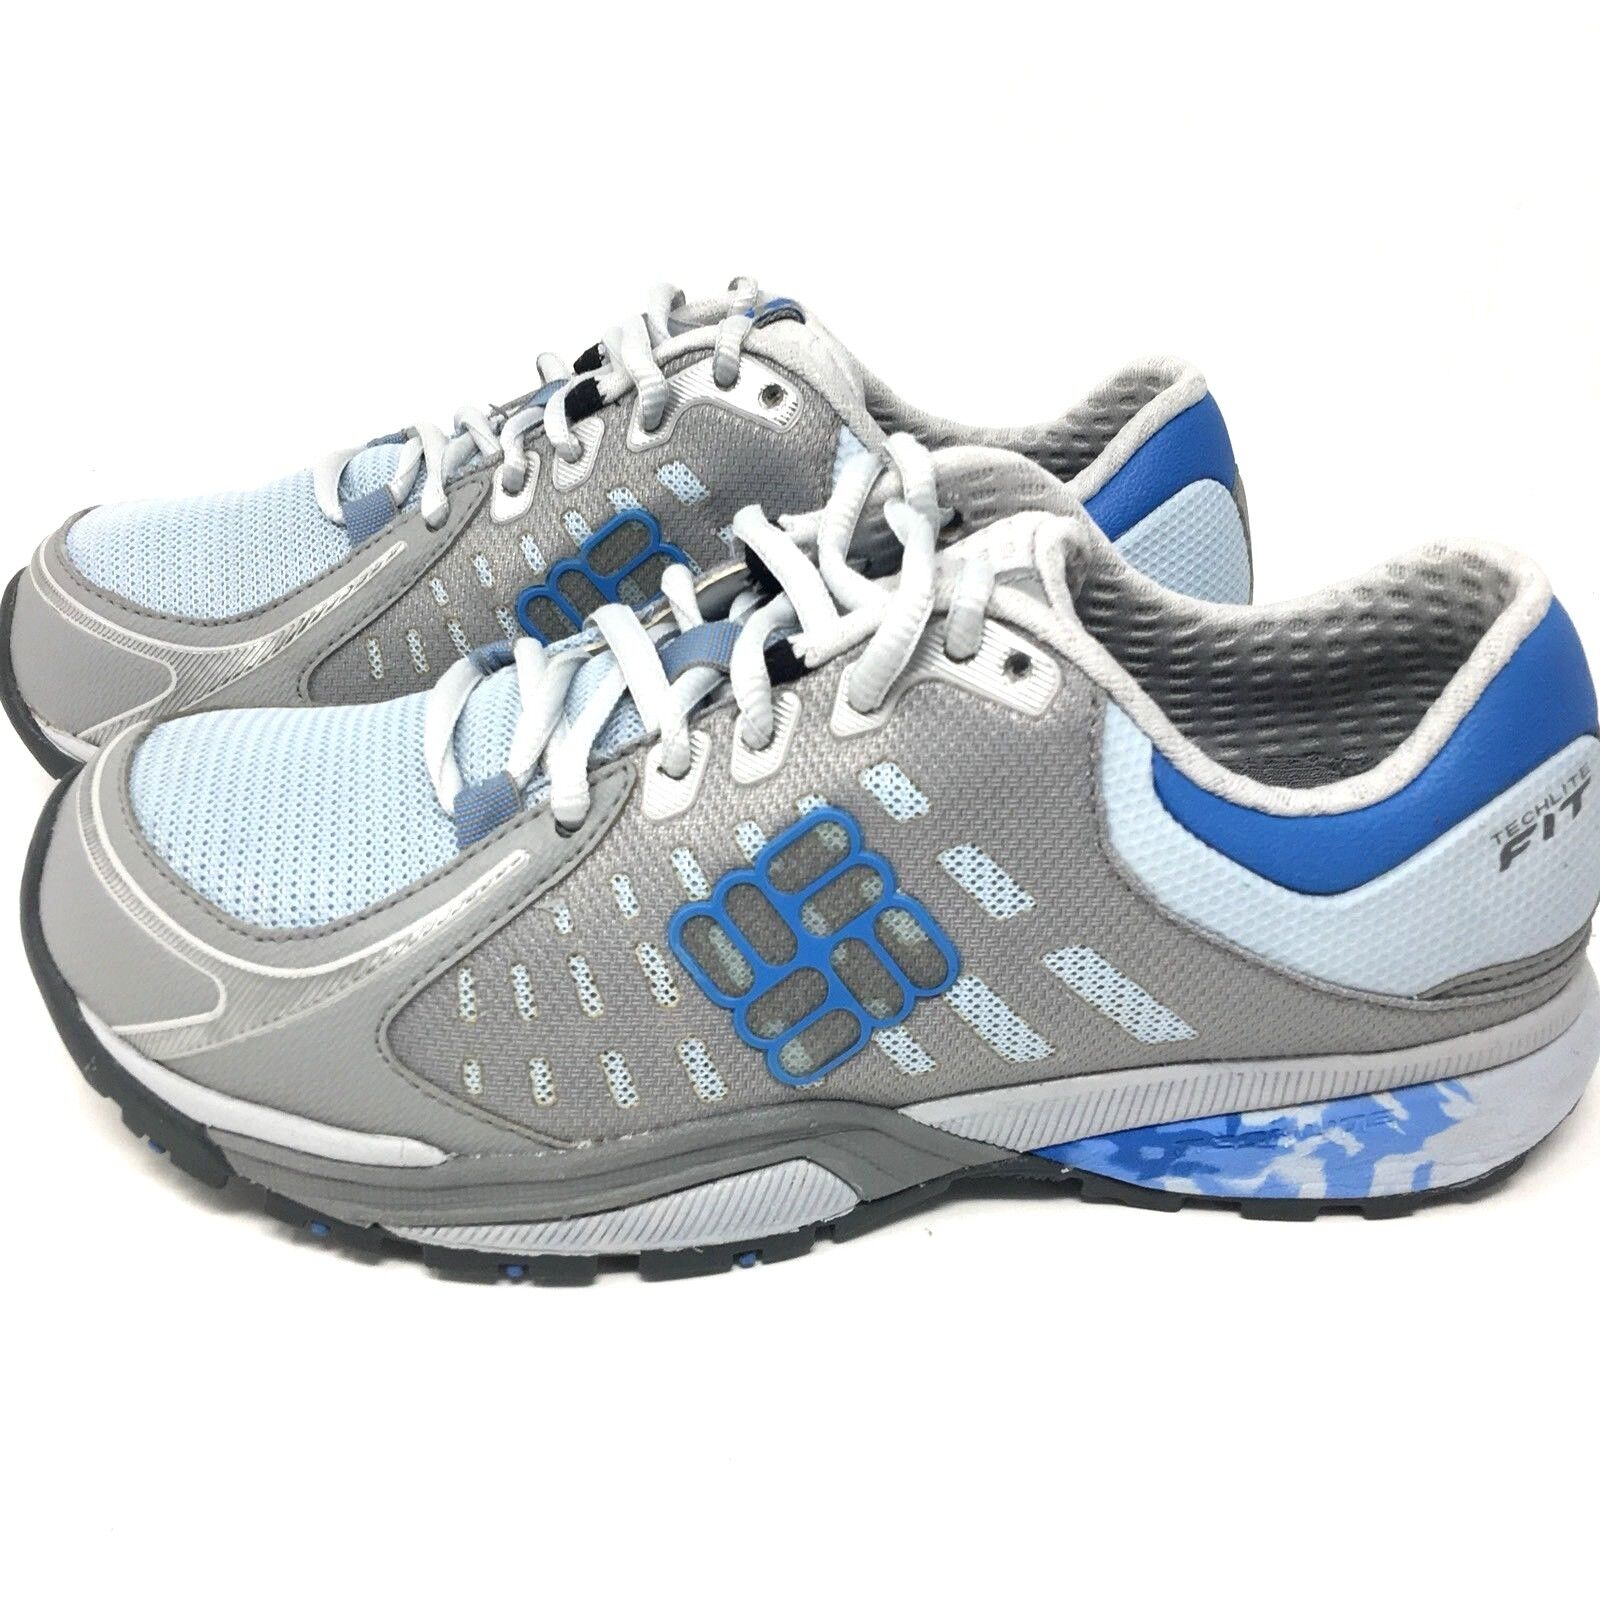 COLUMBIA PeakFreak Low Hiking Trail Women shoes Sneakers Sz 7.5 M  160 BL3749